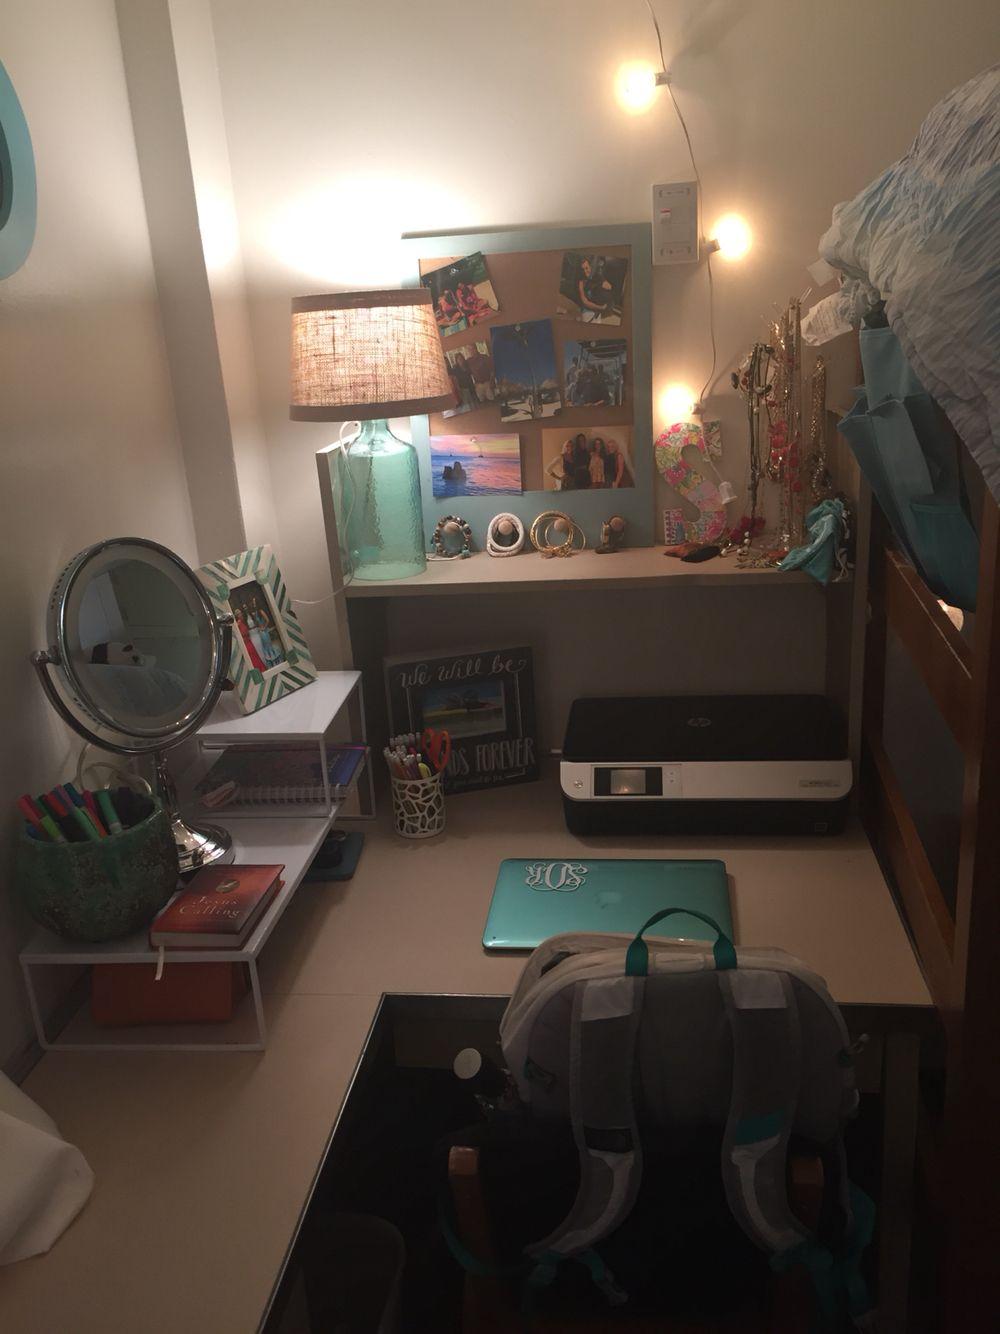 Uga Dorm Russell Hall Uga Dorm Pinterest Dorm And